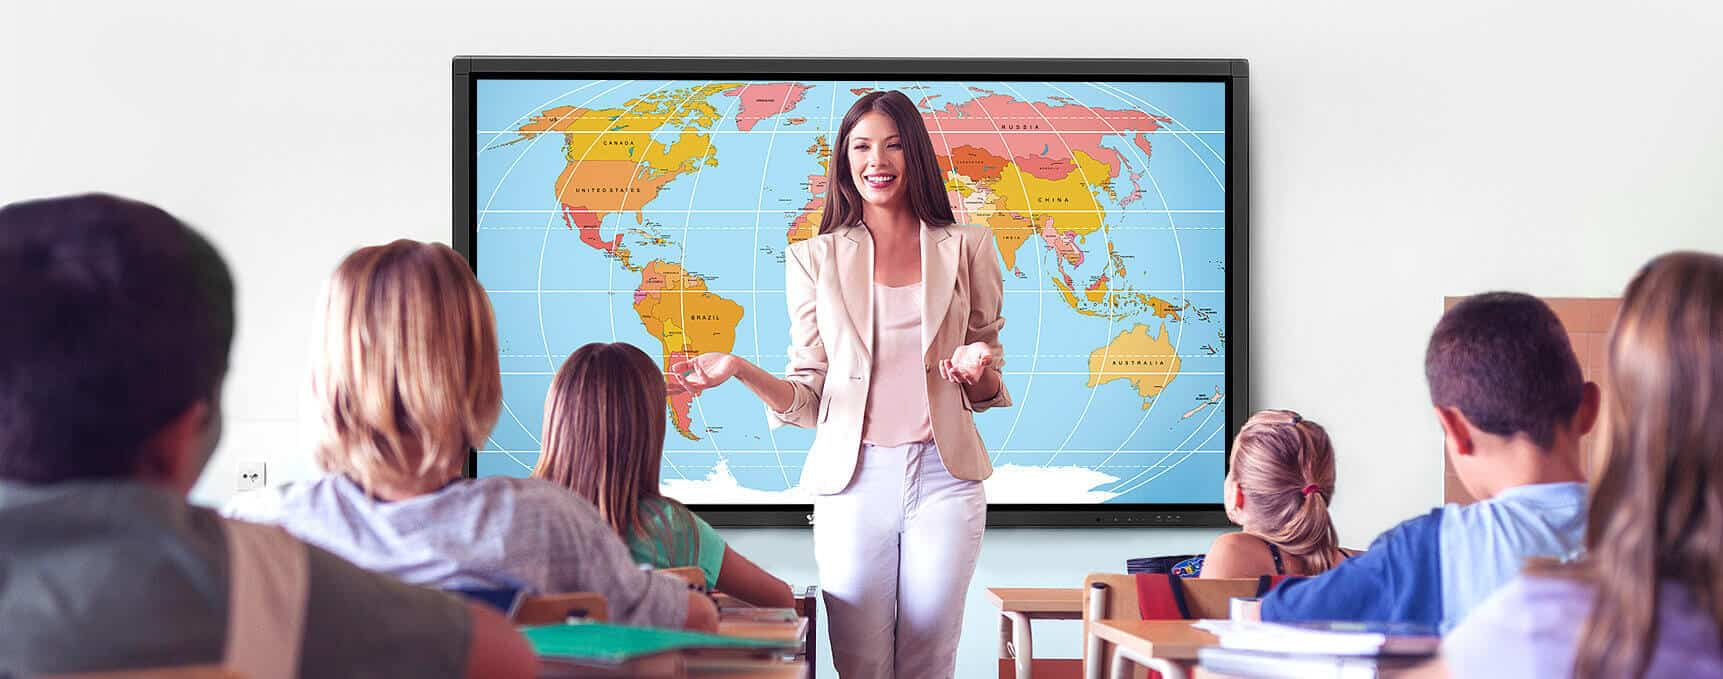 tasmimsabz all in one classroom